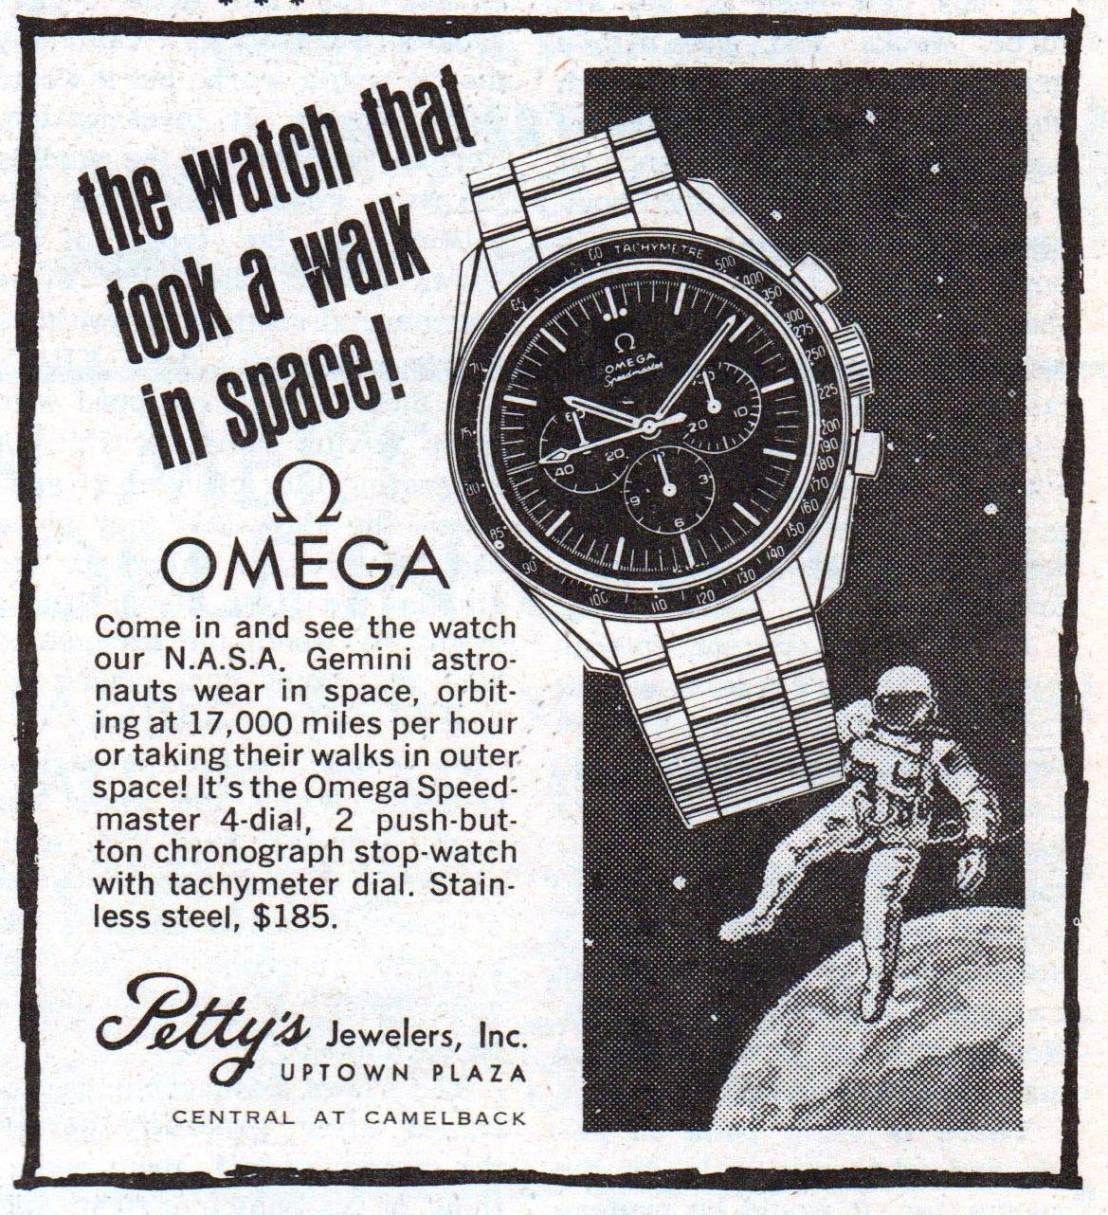 Omega-advert-vintage-watch